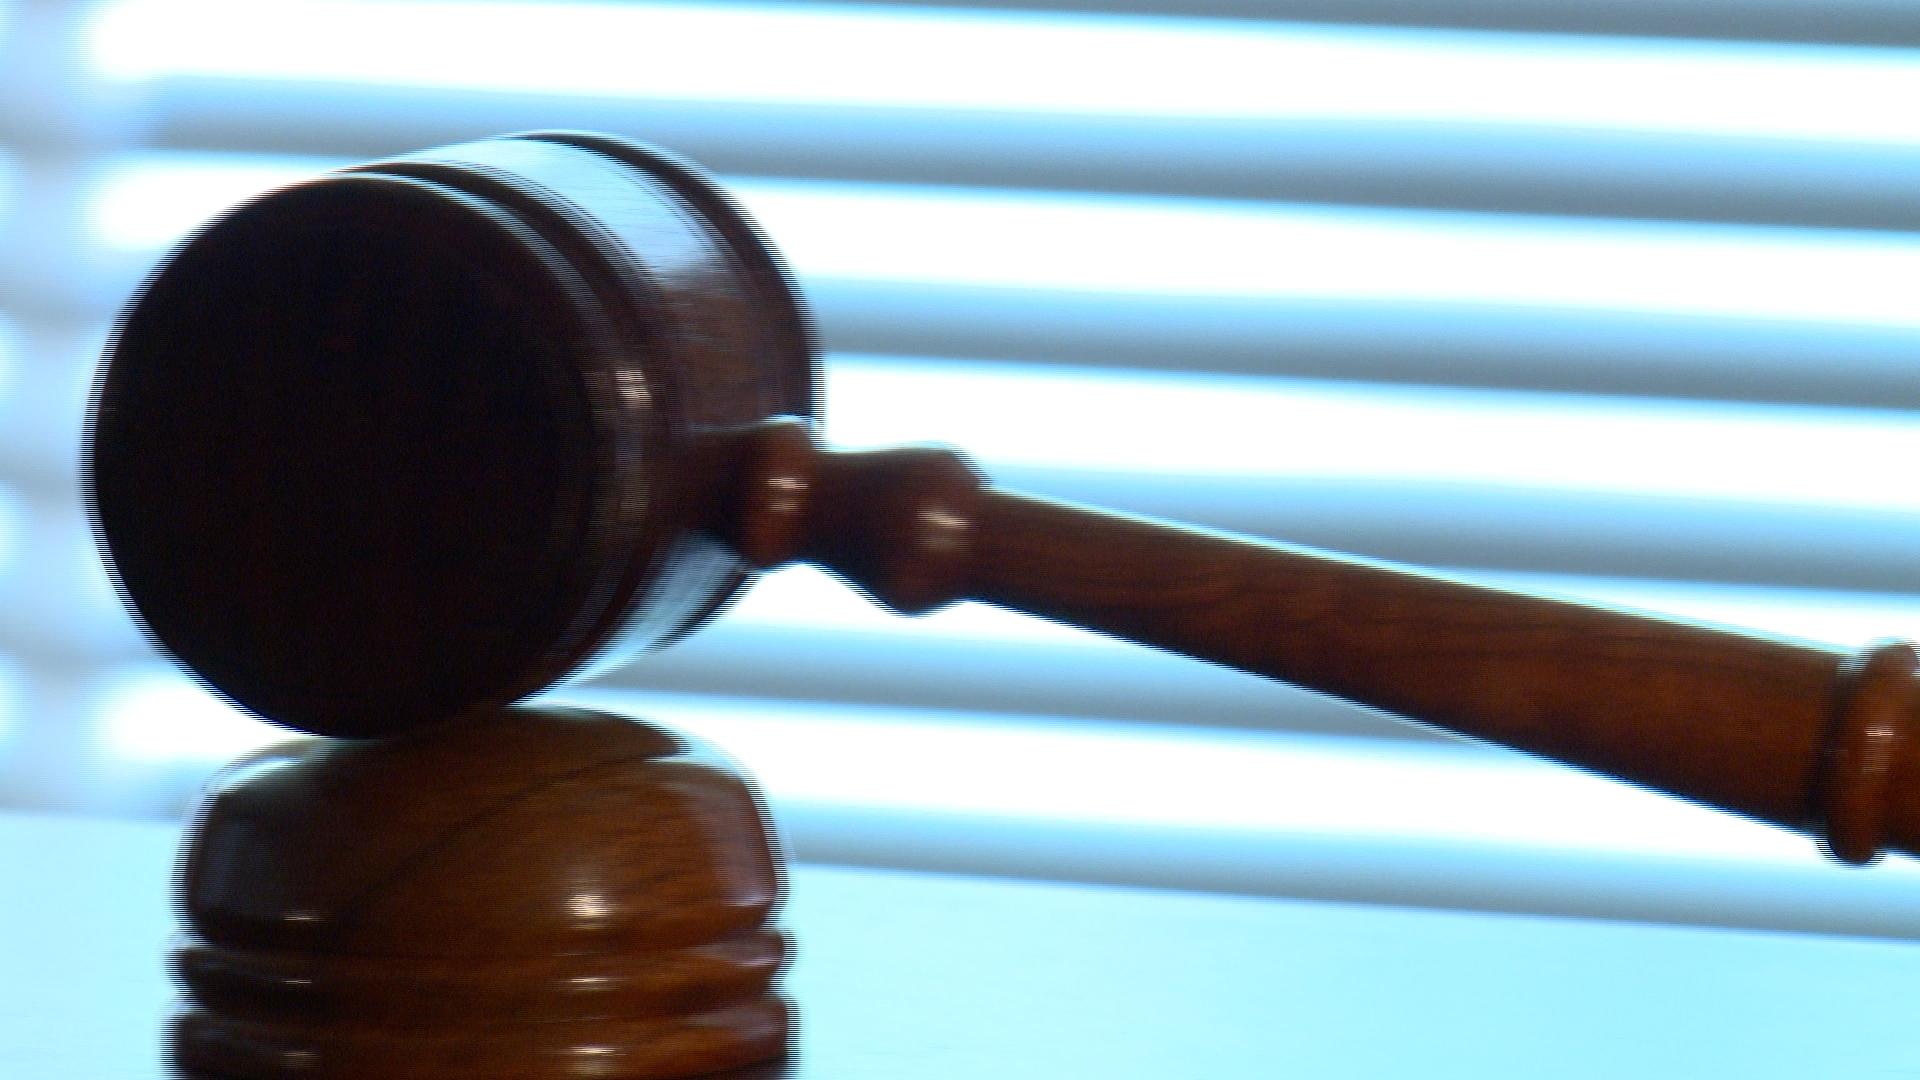 judge gavel_269573